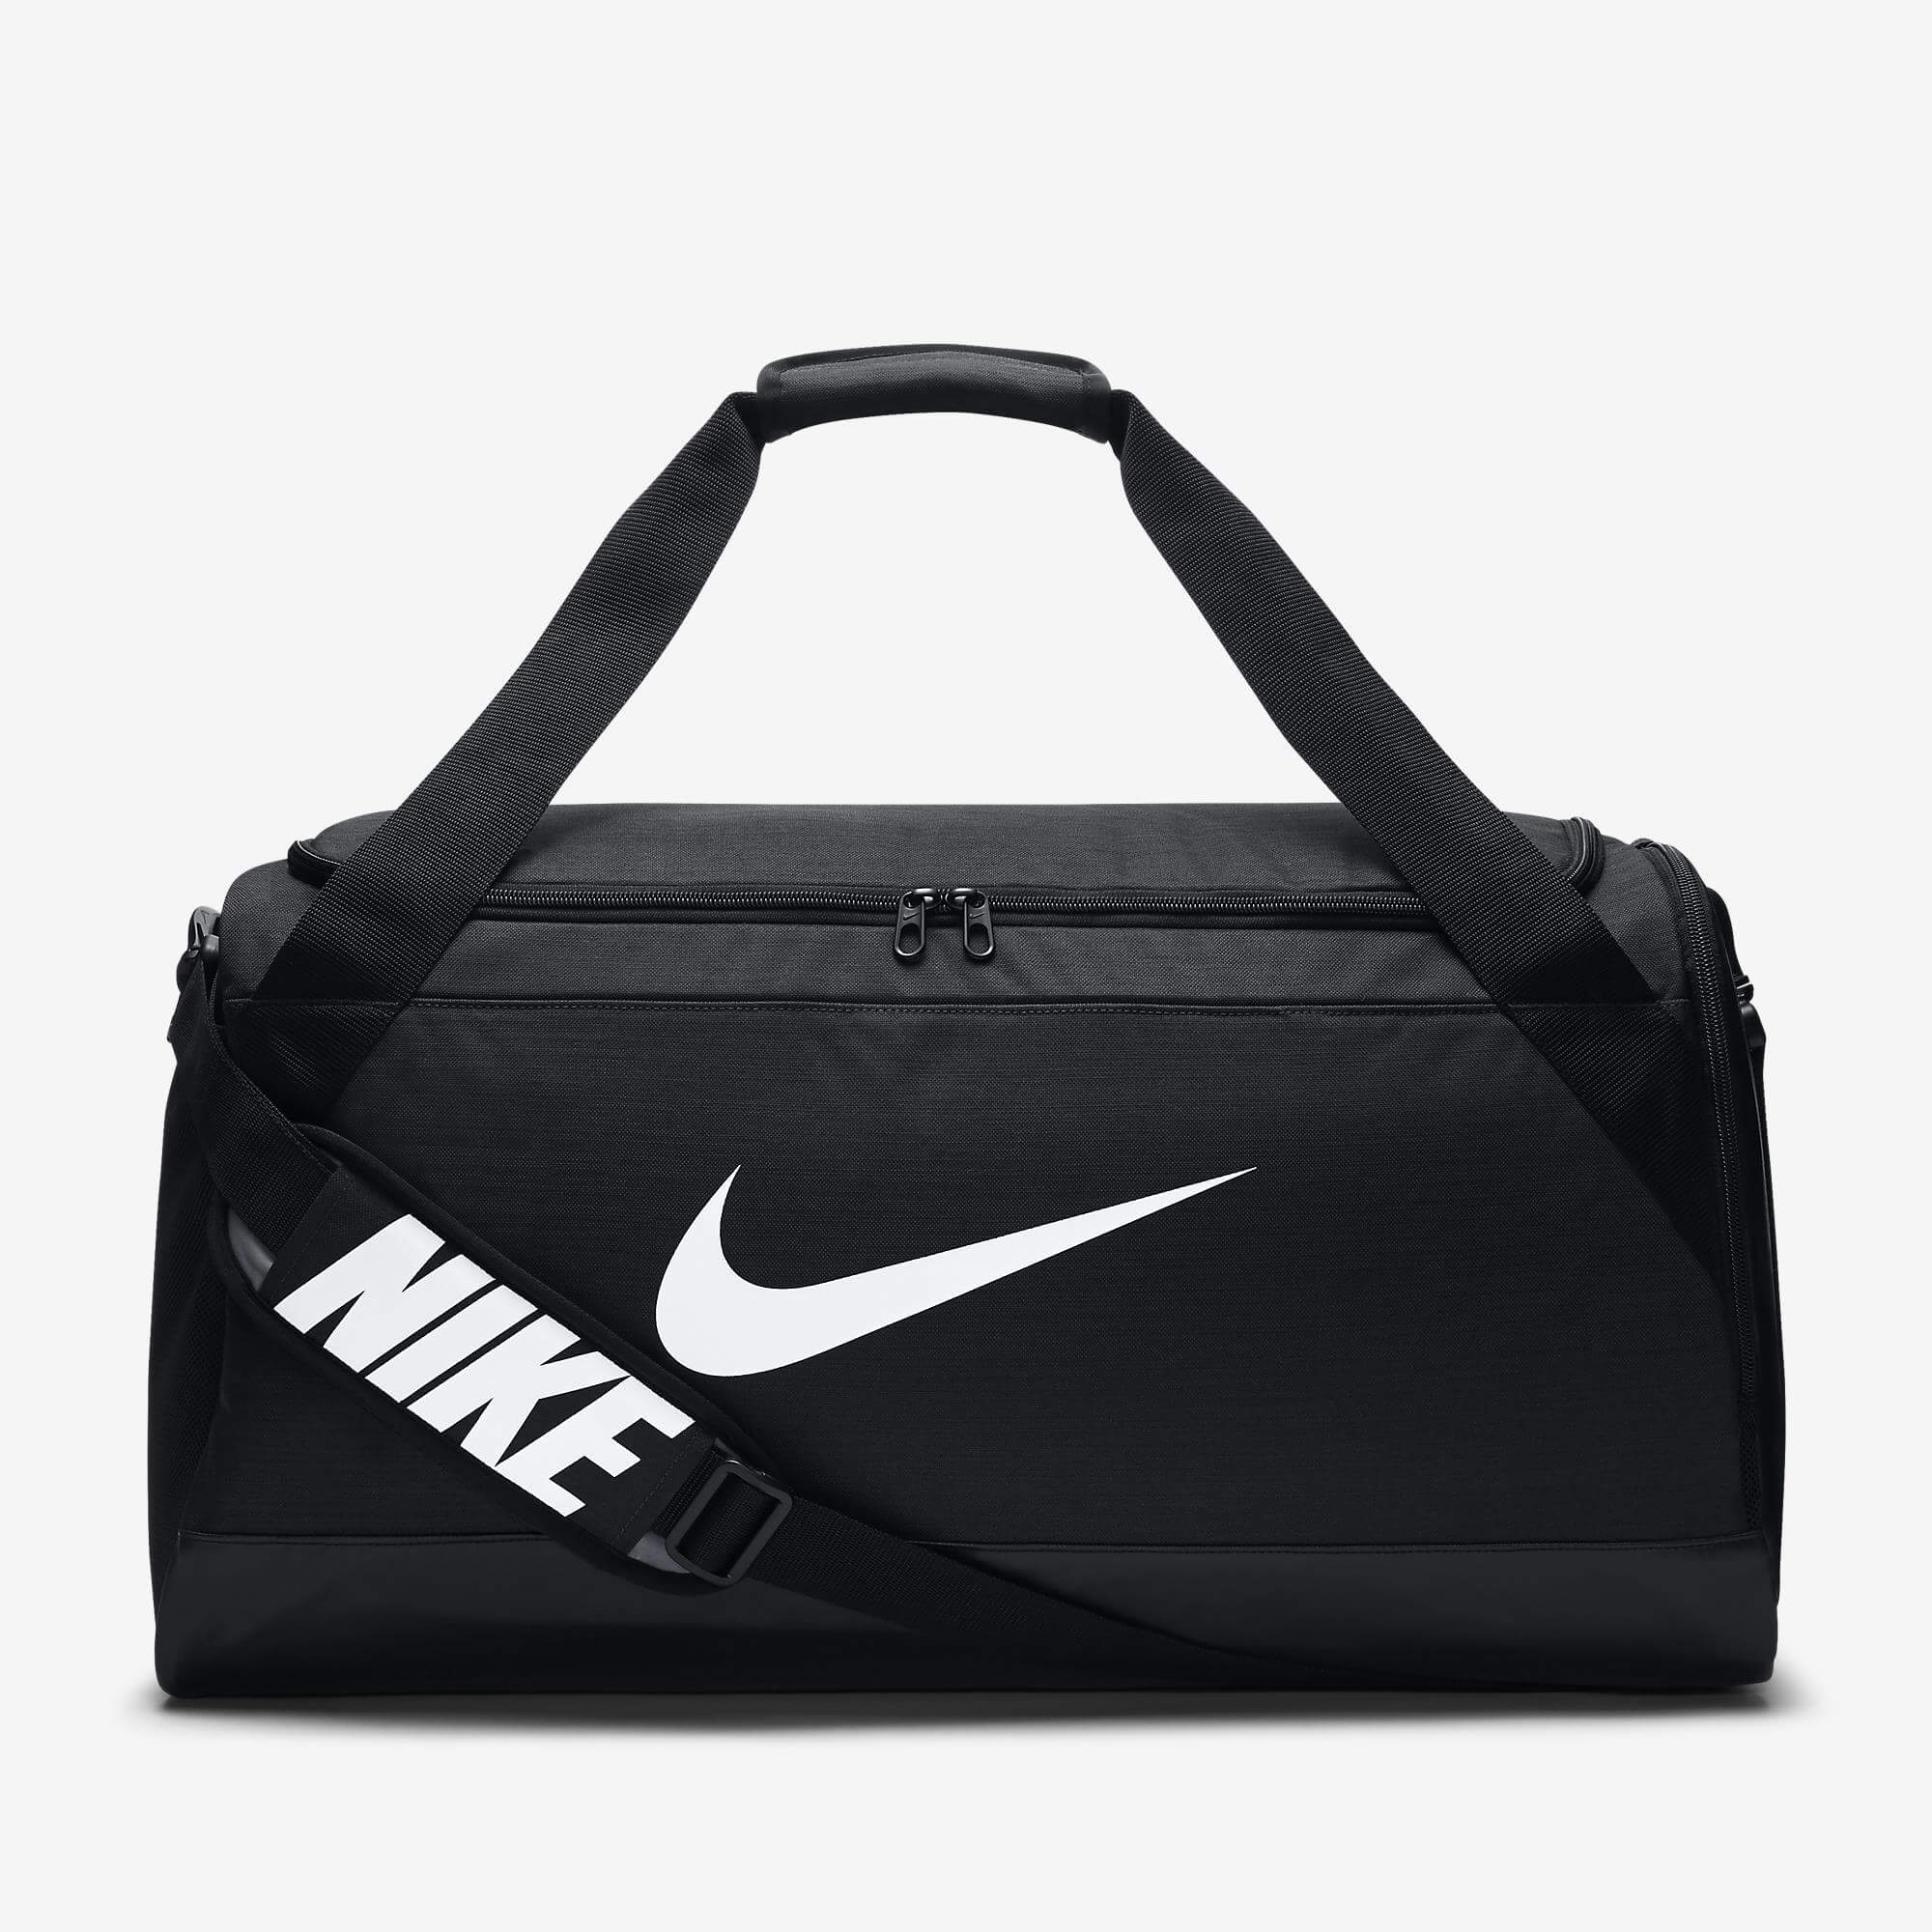 Mala Nike Brasília Duffel Para Treinos